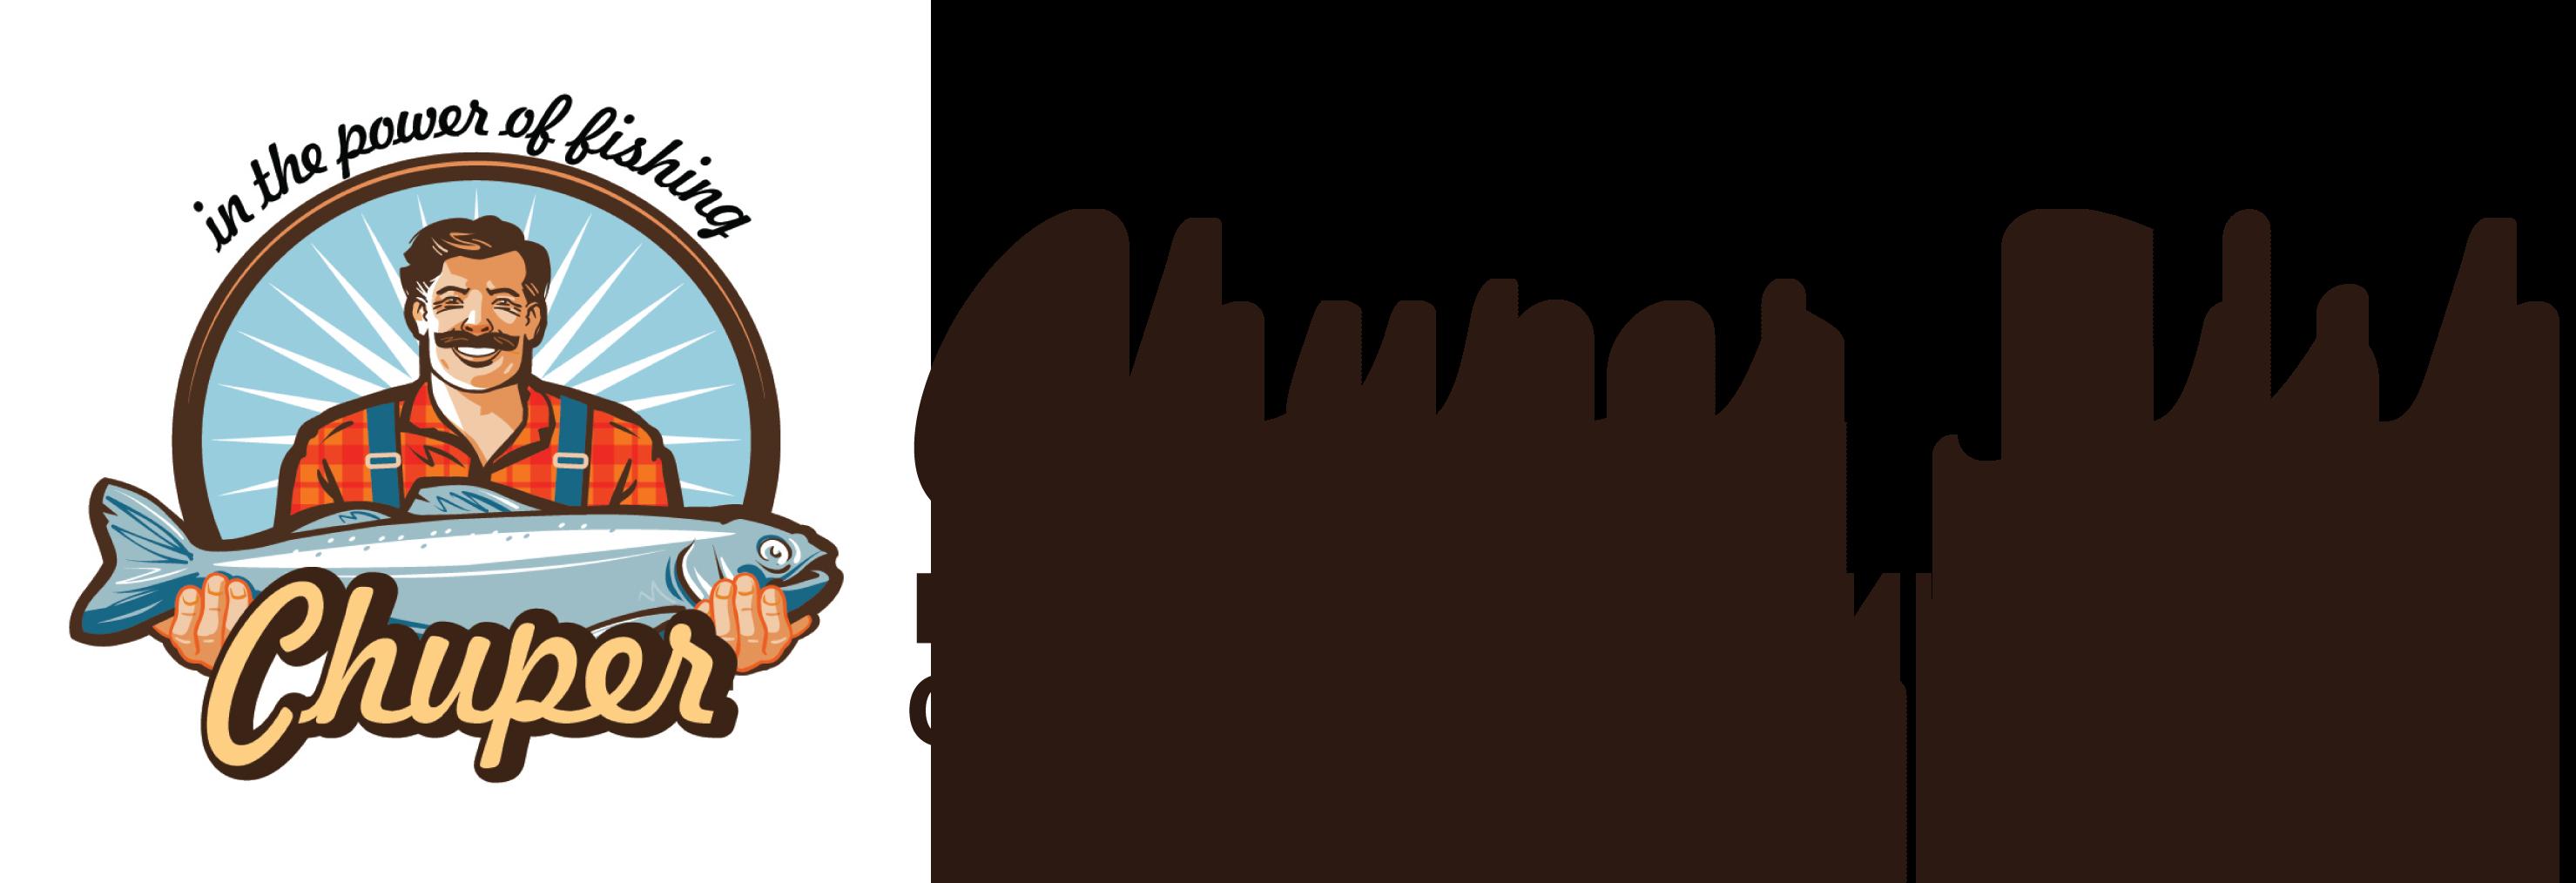 Chuperfish